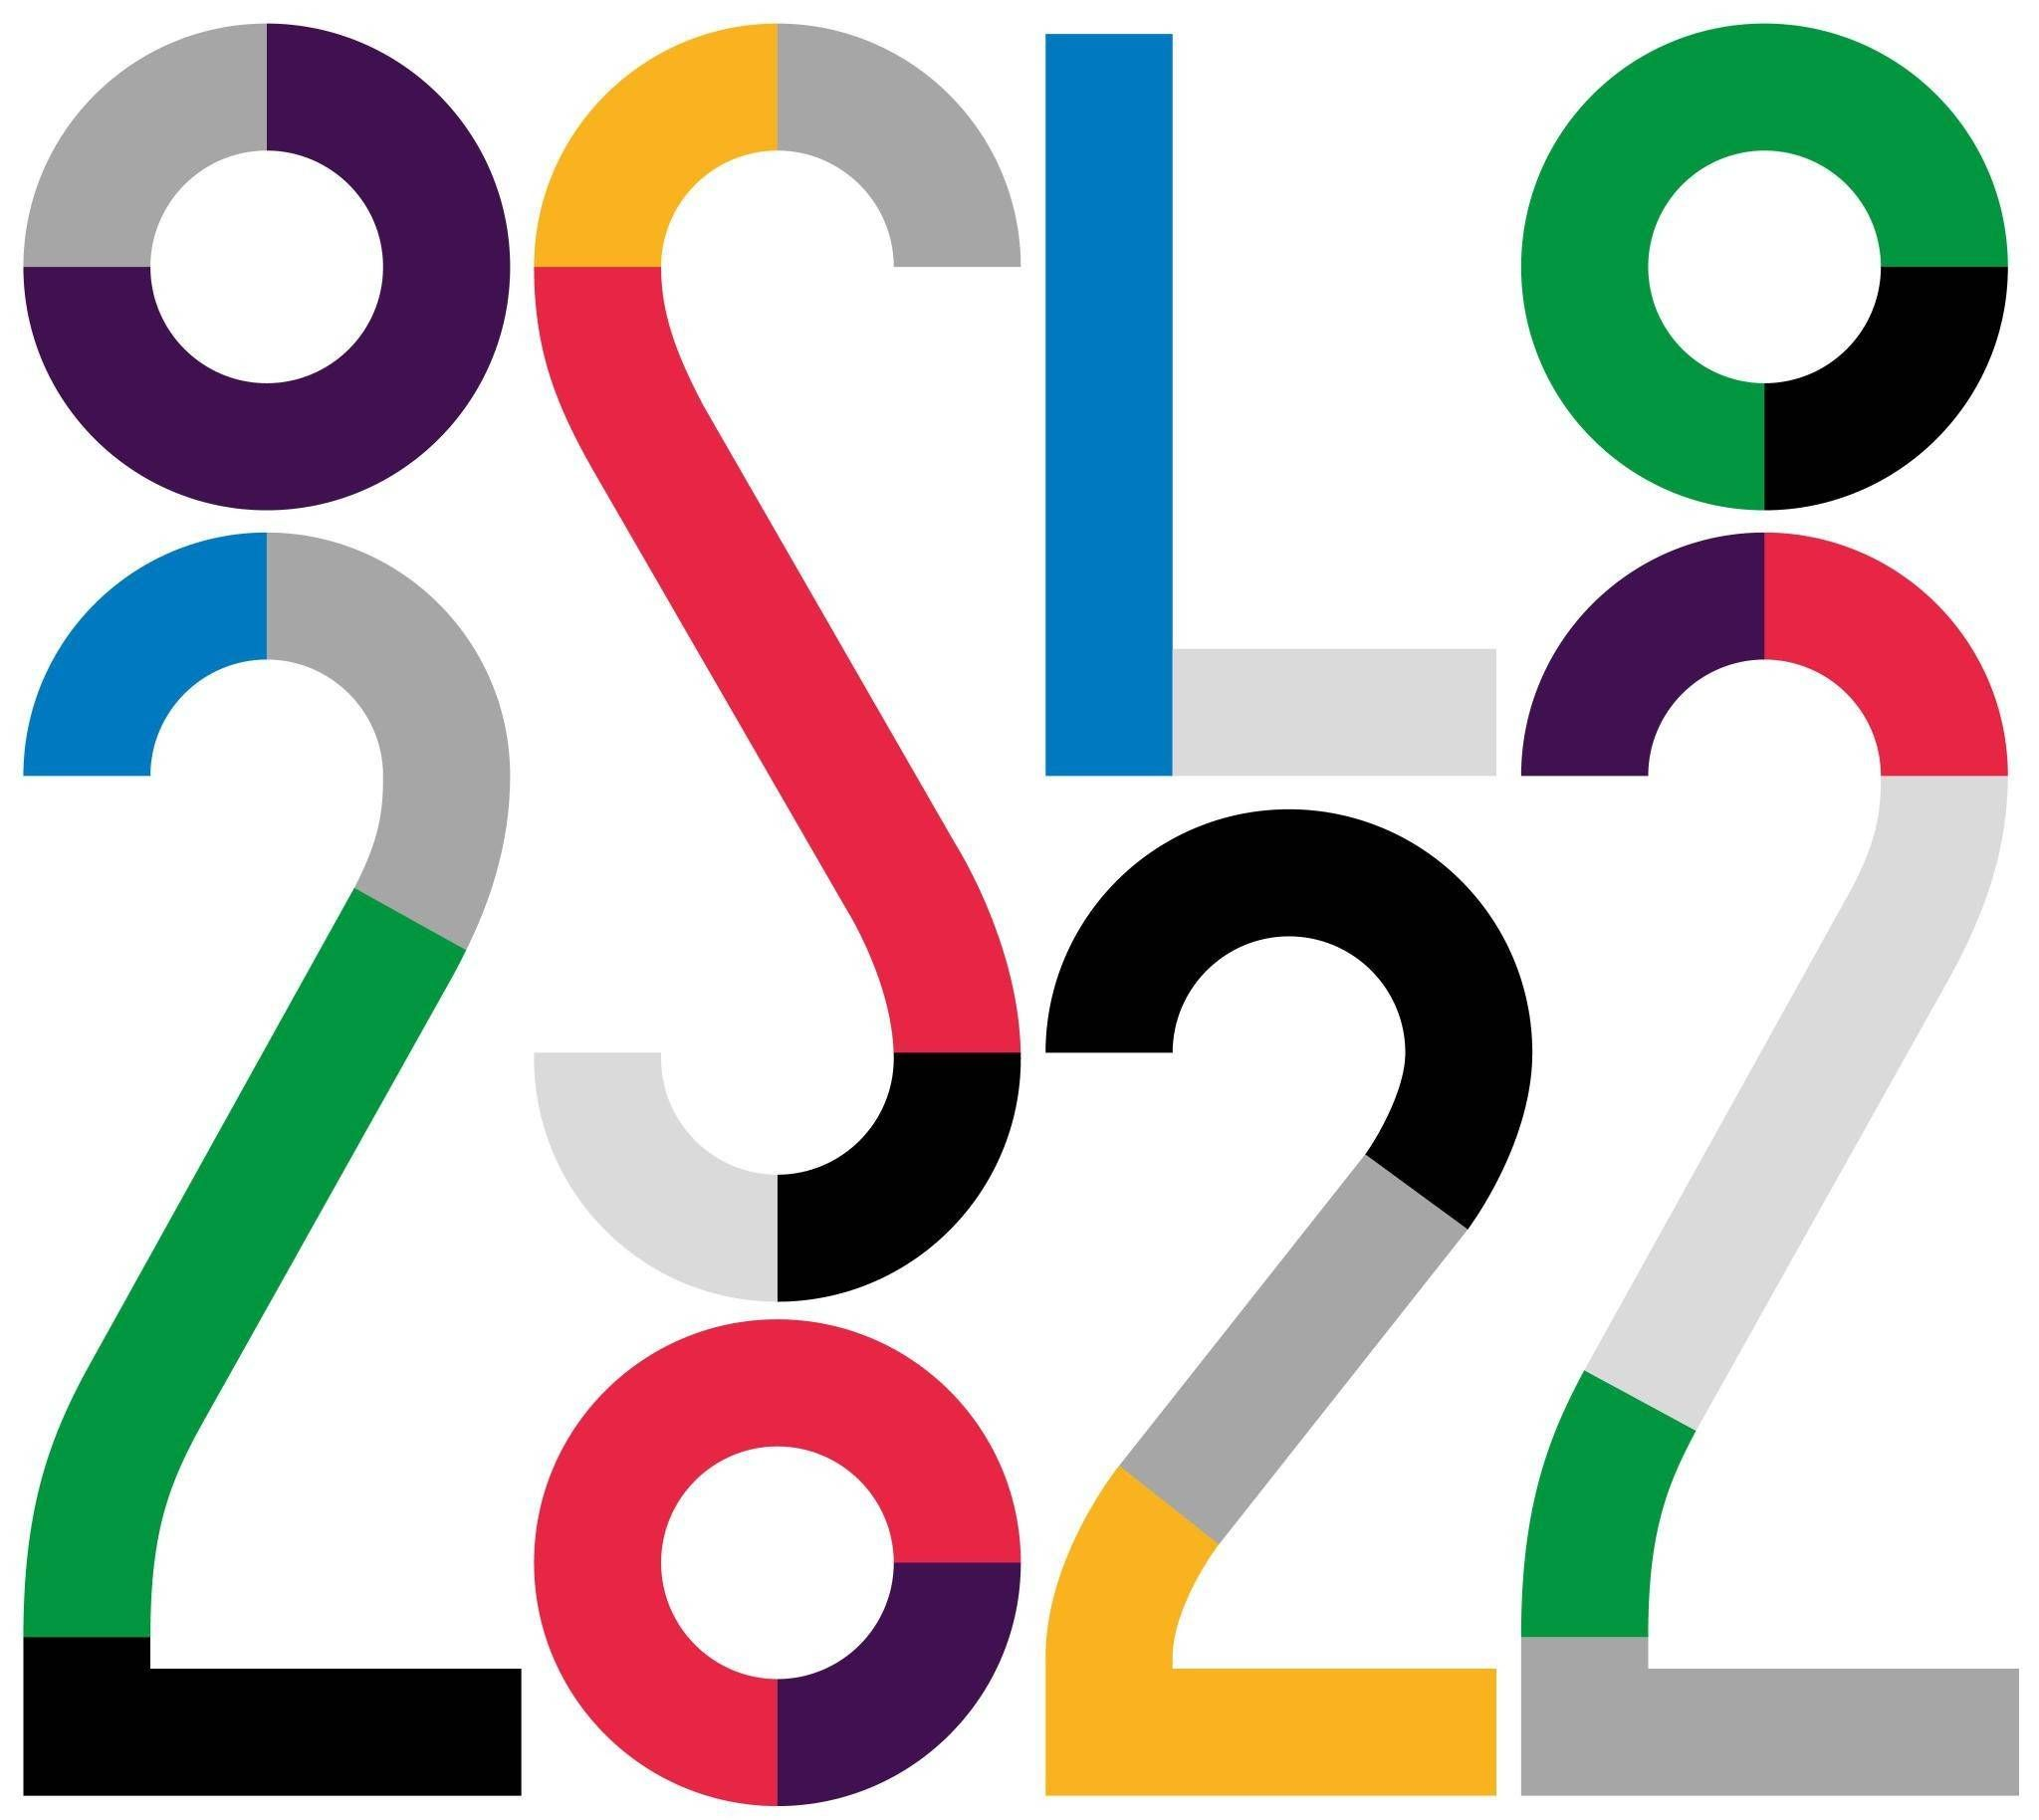 Snøhetta, Oslo 2022 Winter Olympics Olympic logo, Visual